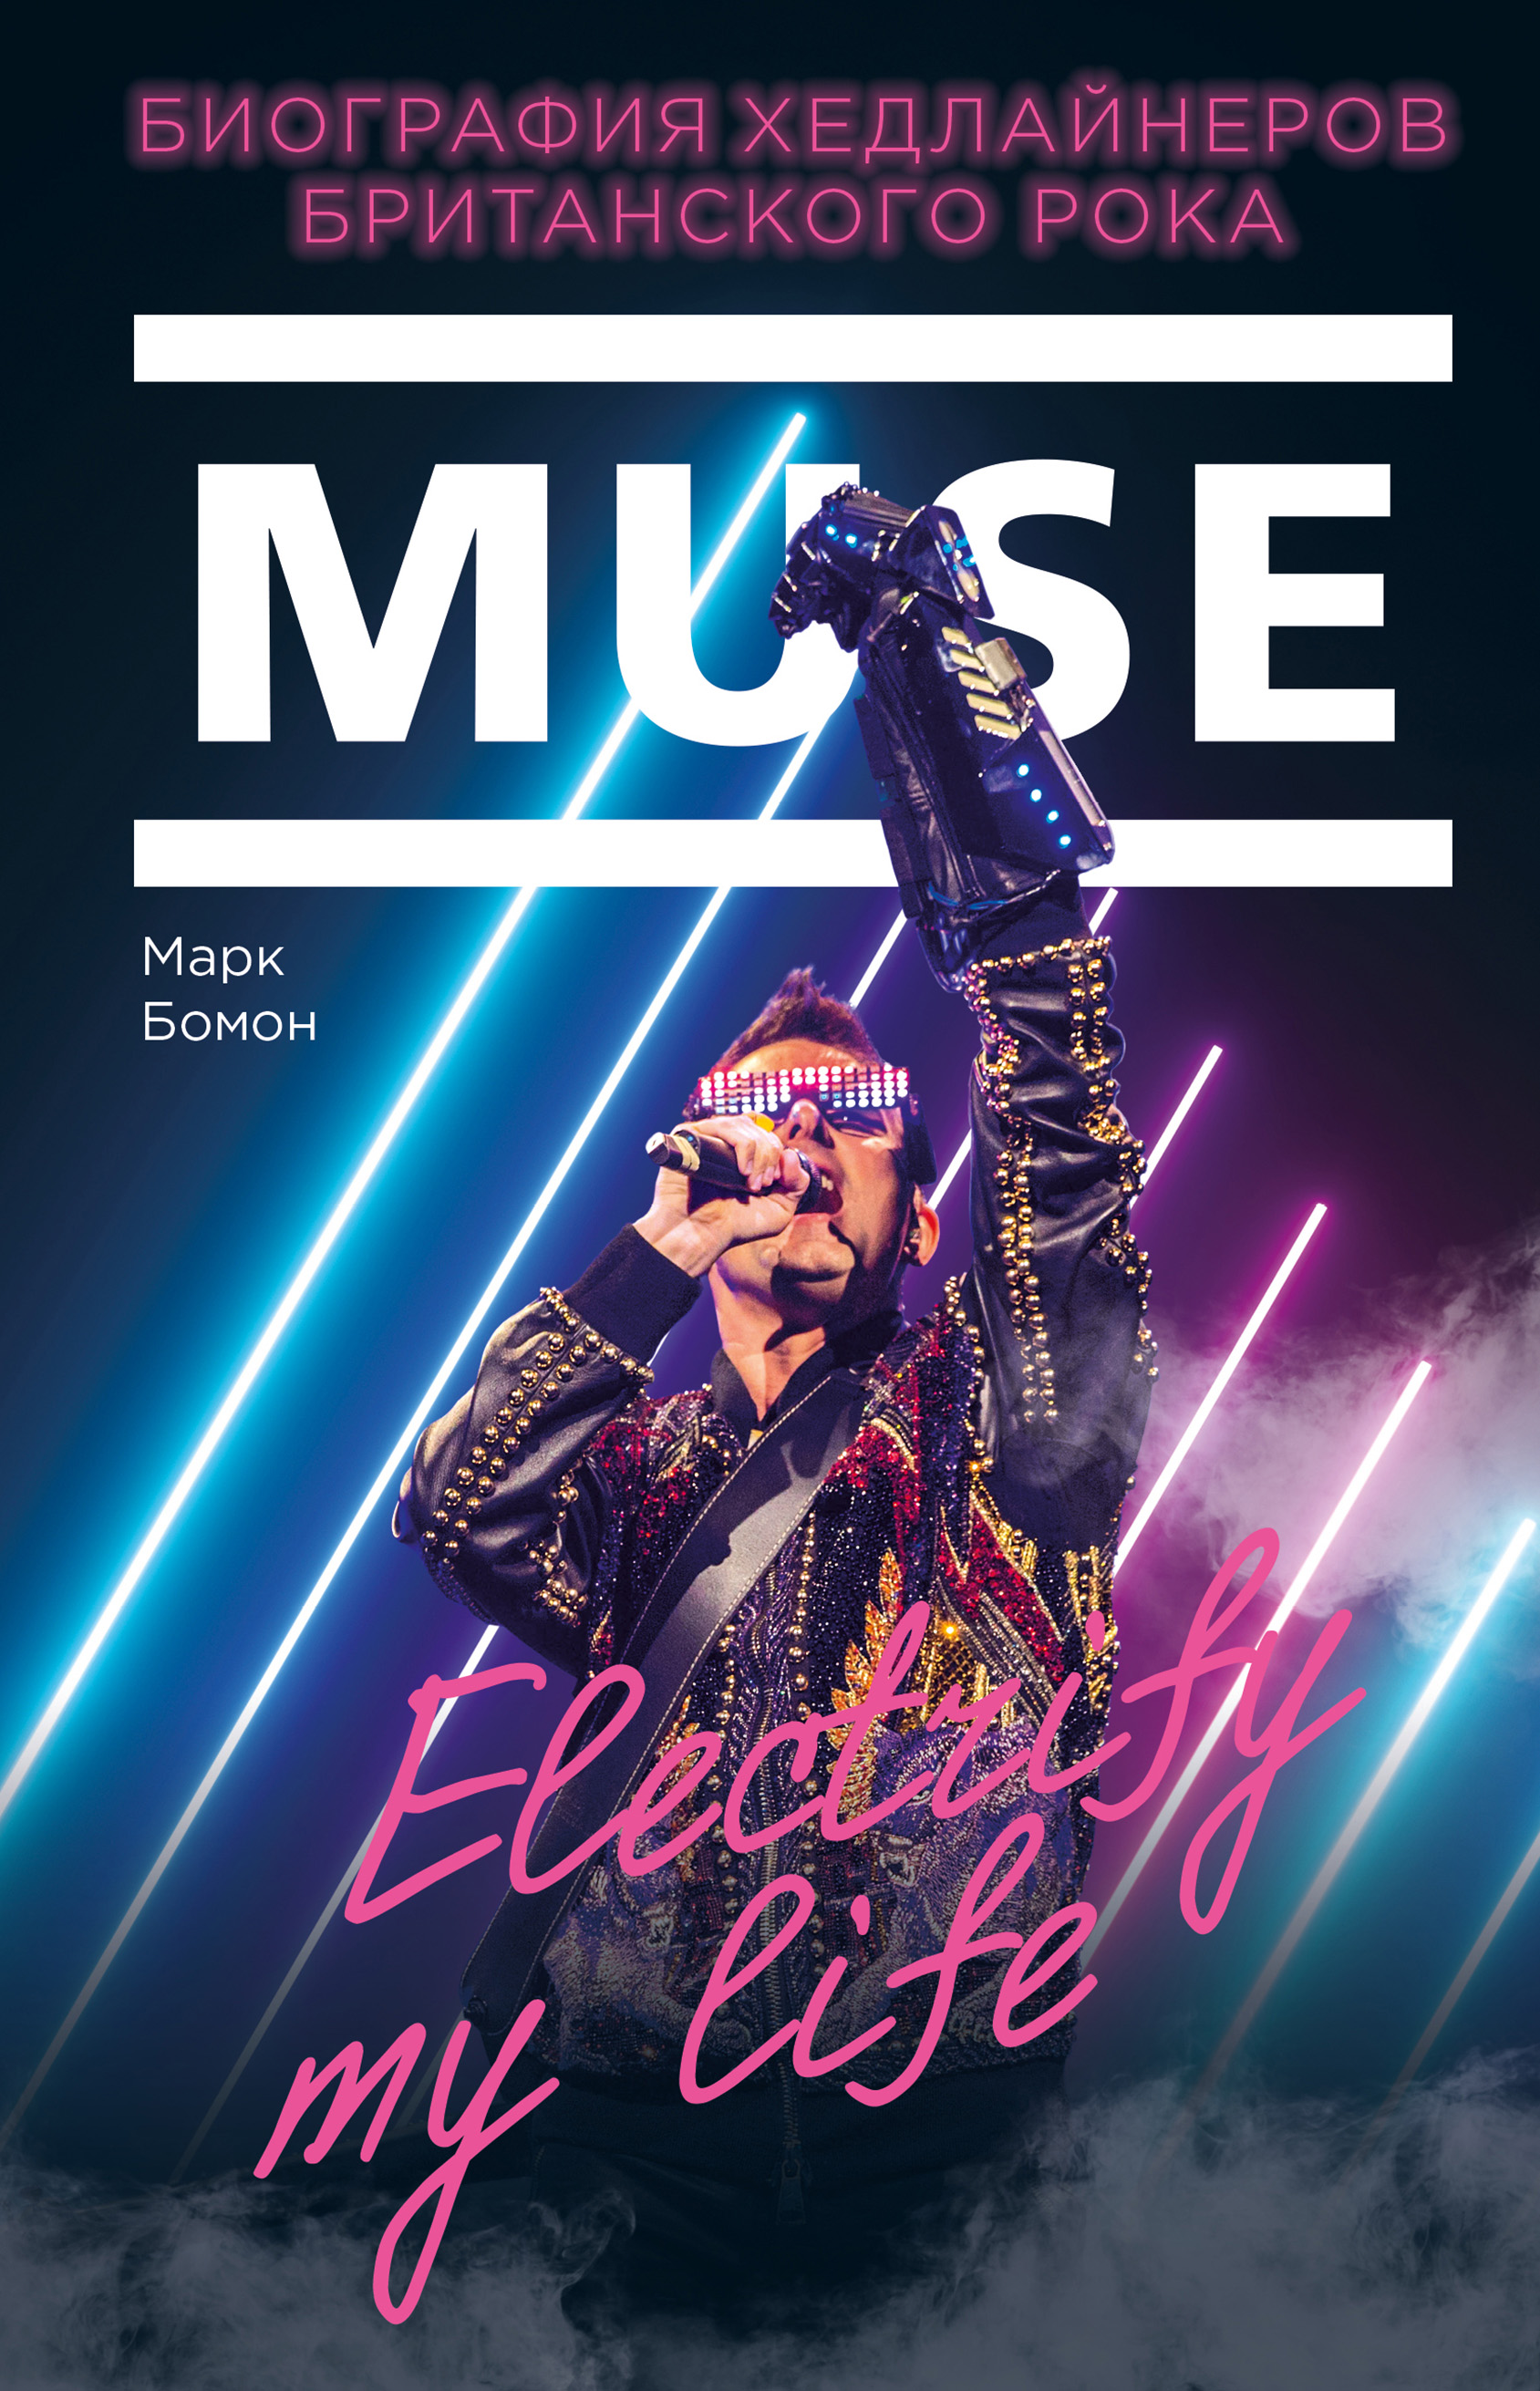 Марк Бомон. Muse. Electrify my life. Биография хедлайнеров британского рока